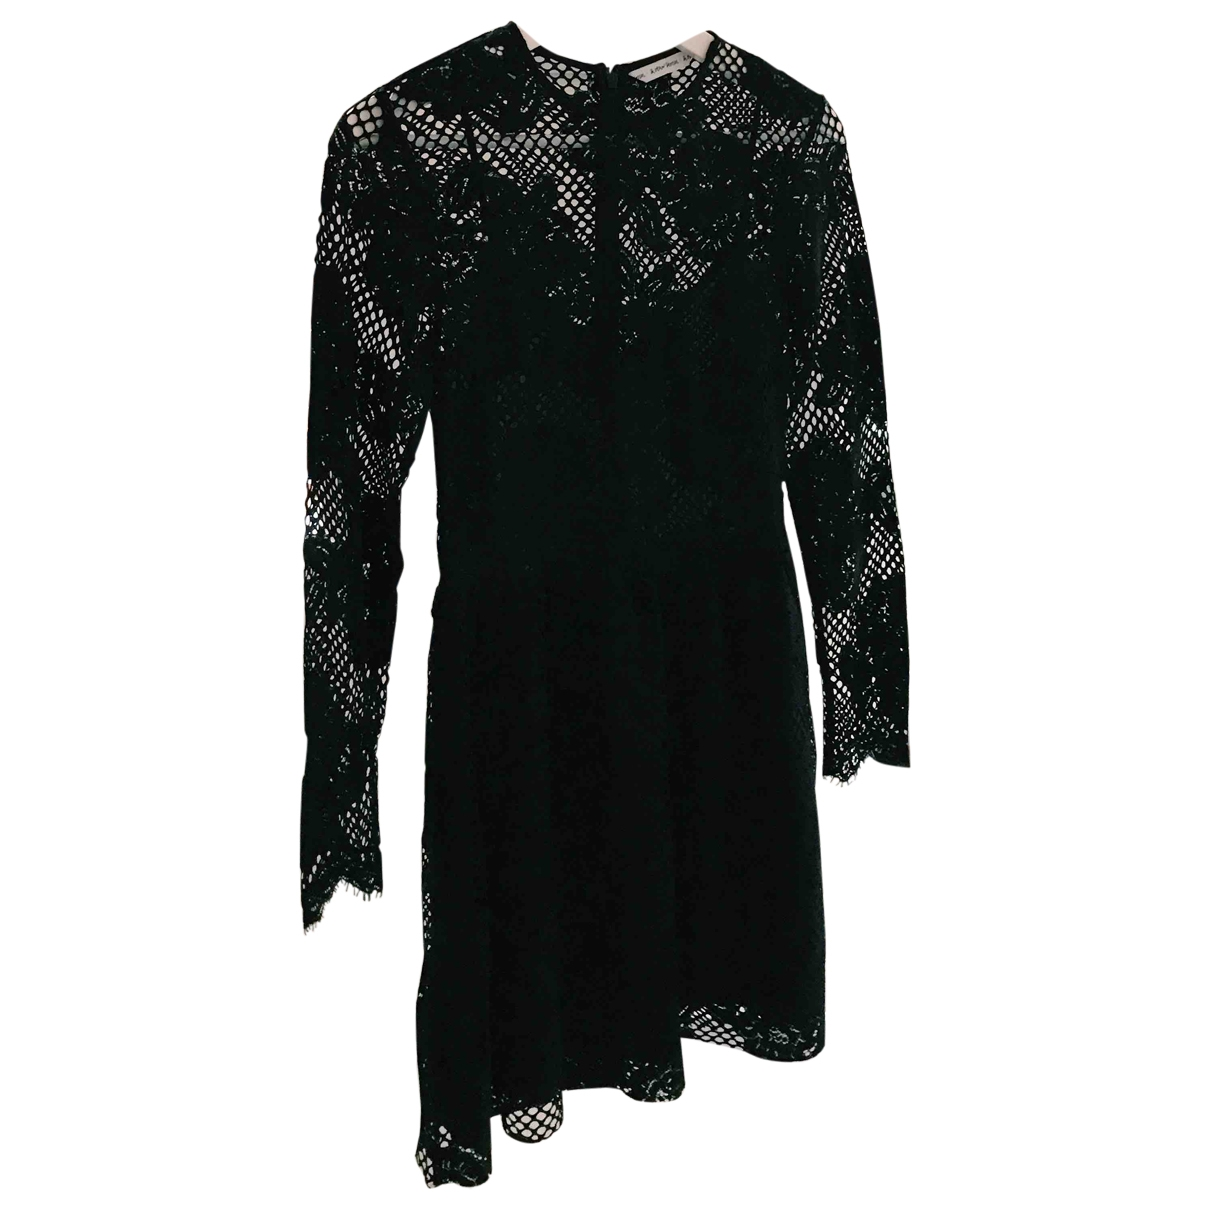 & Other Stories - Robe   pour femme en dentelle - noir